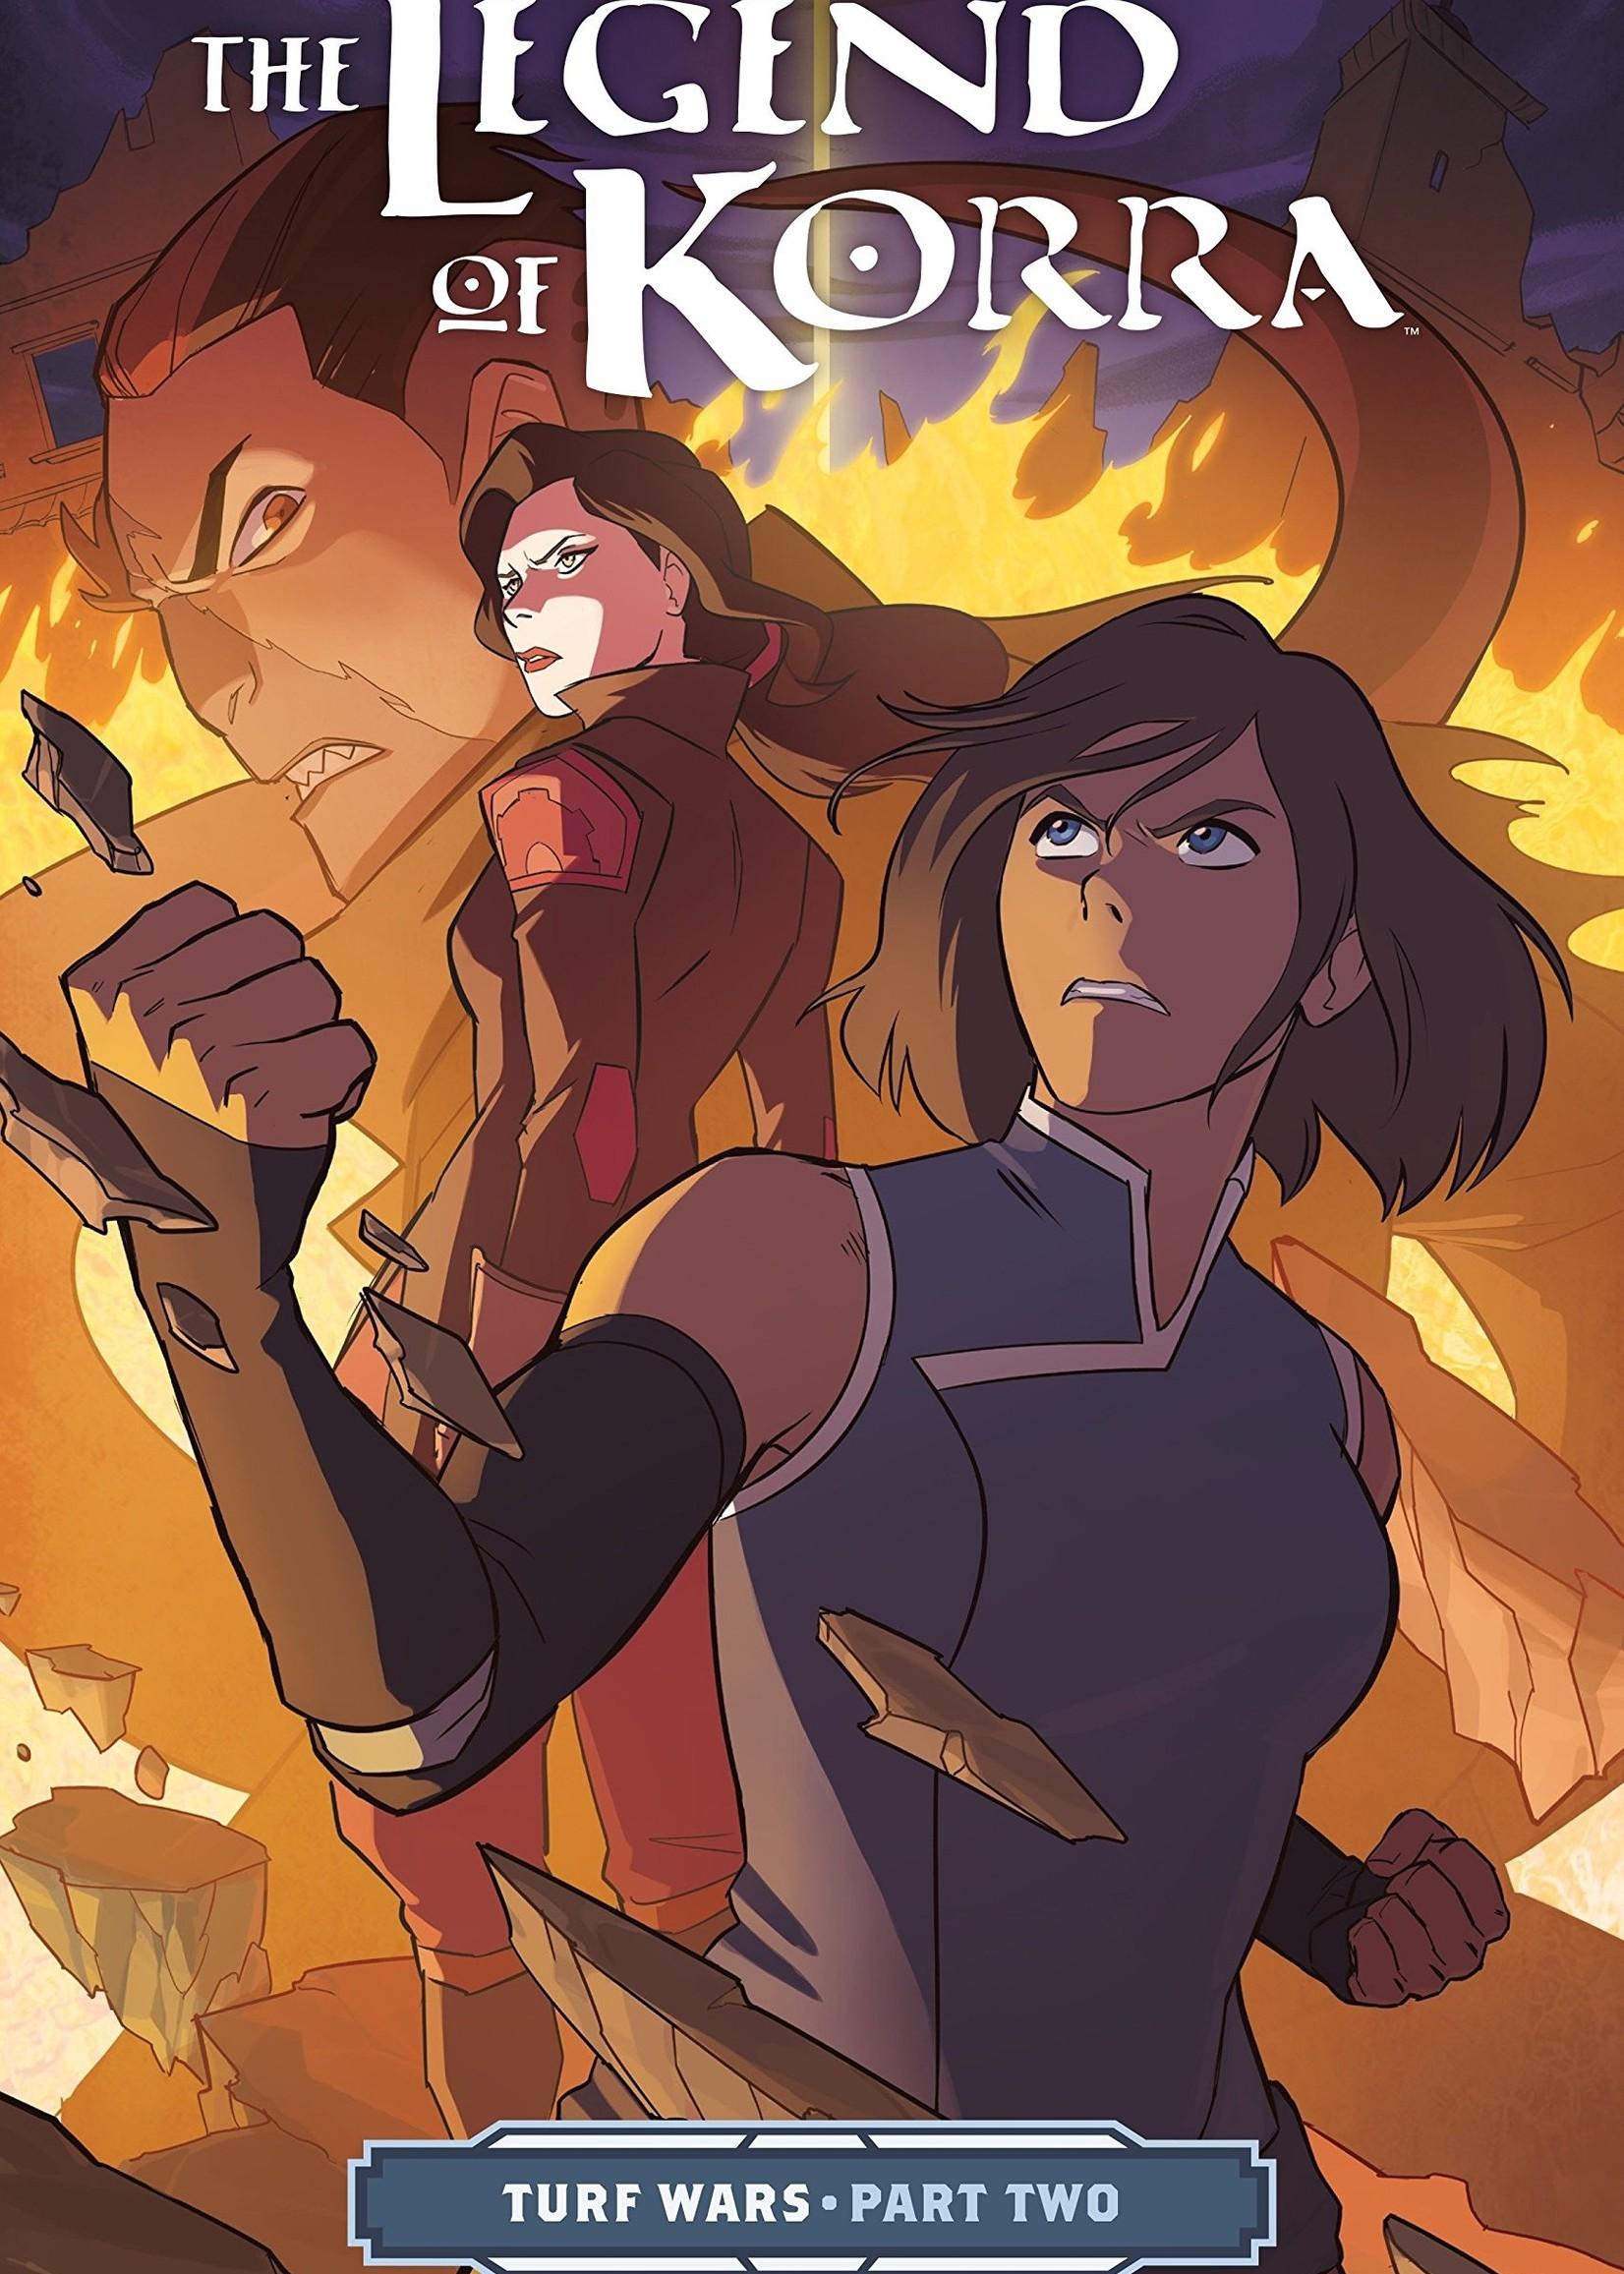 Dark Horse Comics The Legend of Korra Graphic Novel #02, Turf Wars Part 2 - Paperback